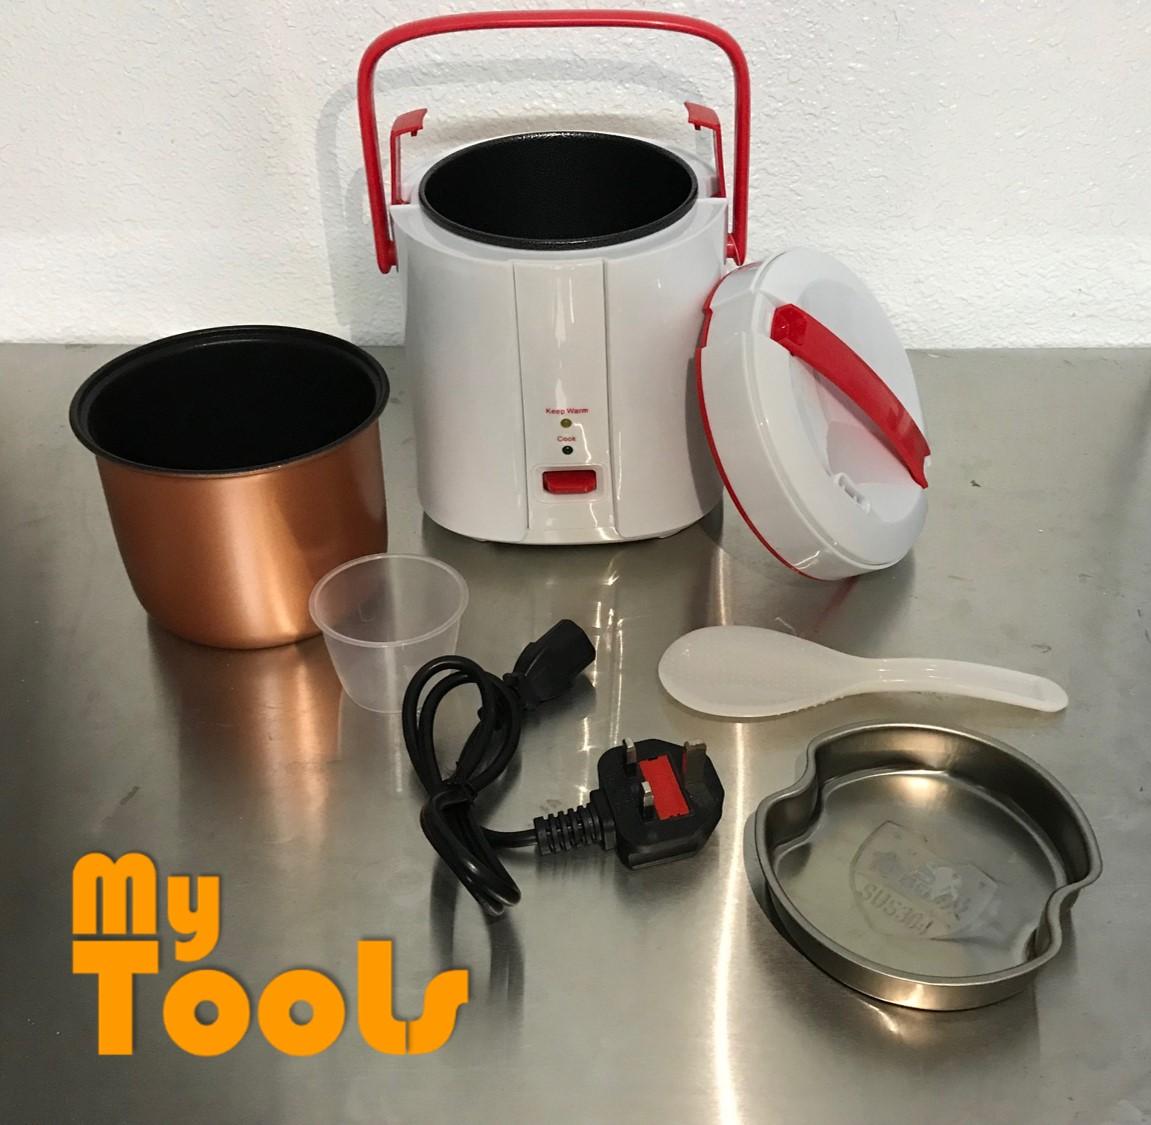 [Malaysia 3-Pin Plug] Mytools 1.8L Portable Compact Mini Electric Rice Cooker